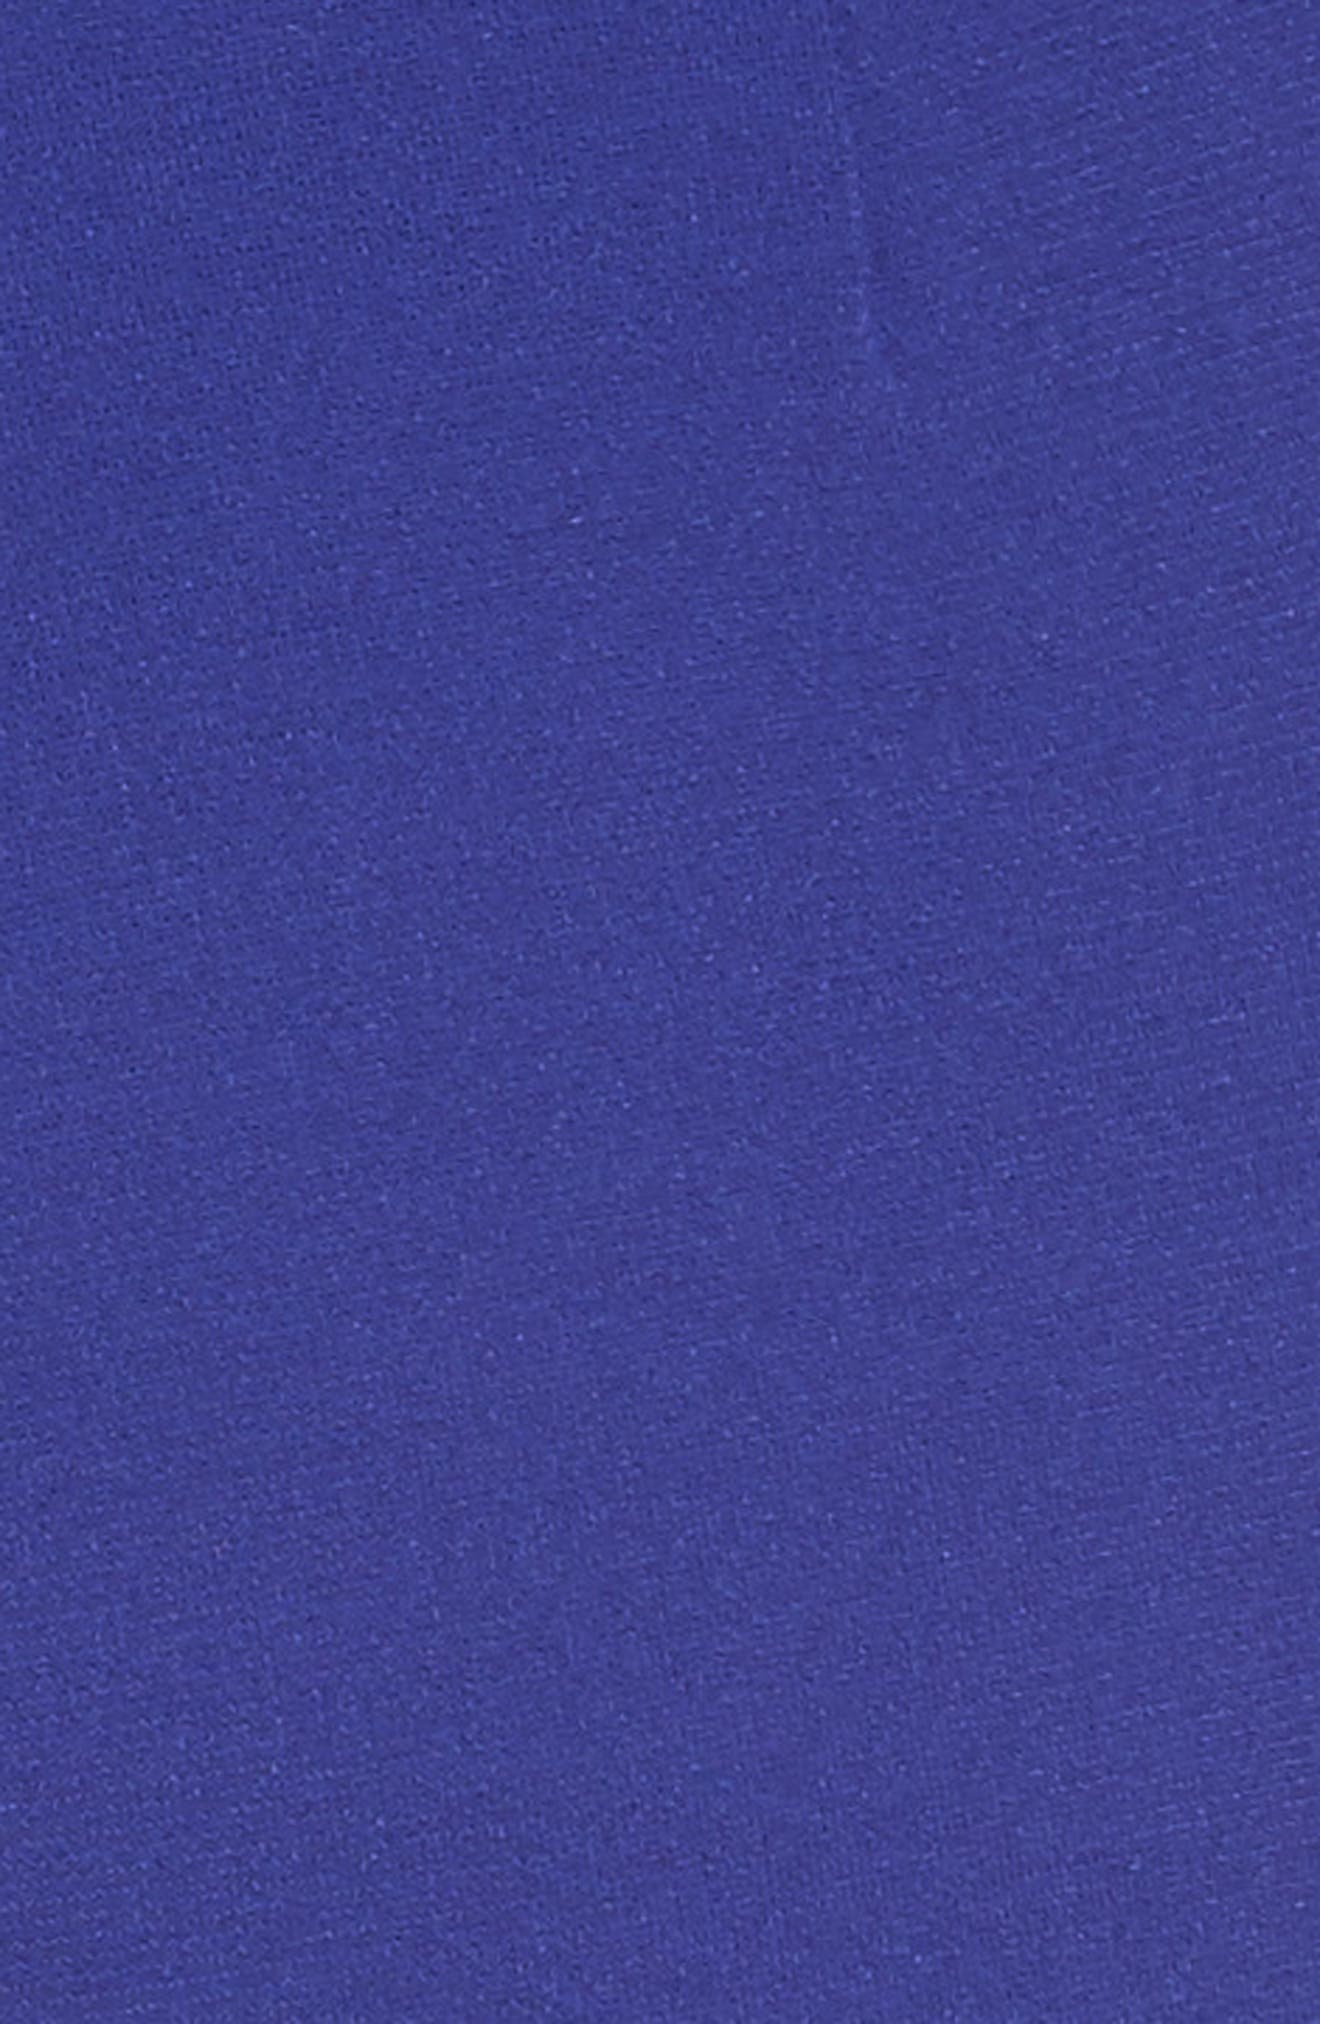 Calerno Crepe Crop Trousers,                             Alternate thumbnail 5, color,                             Violet